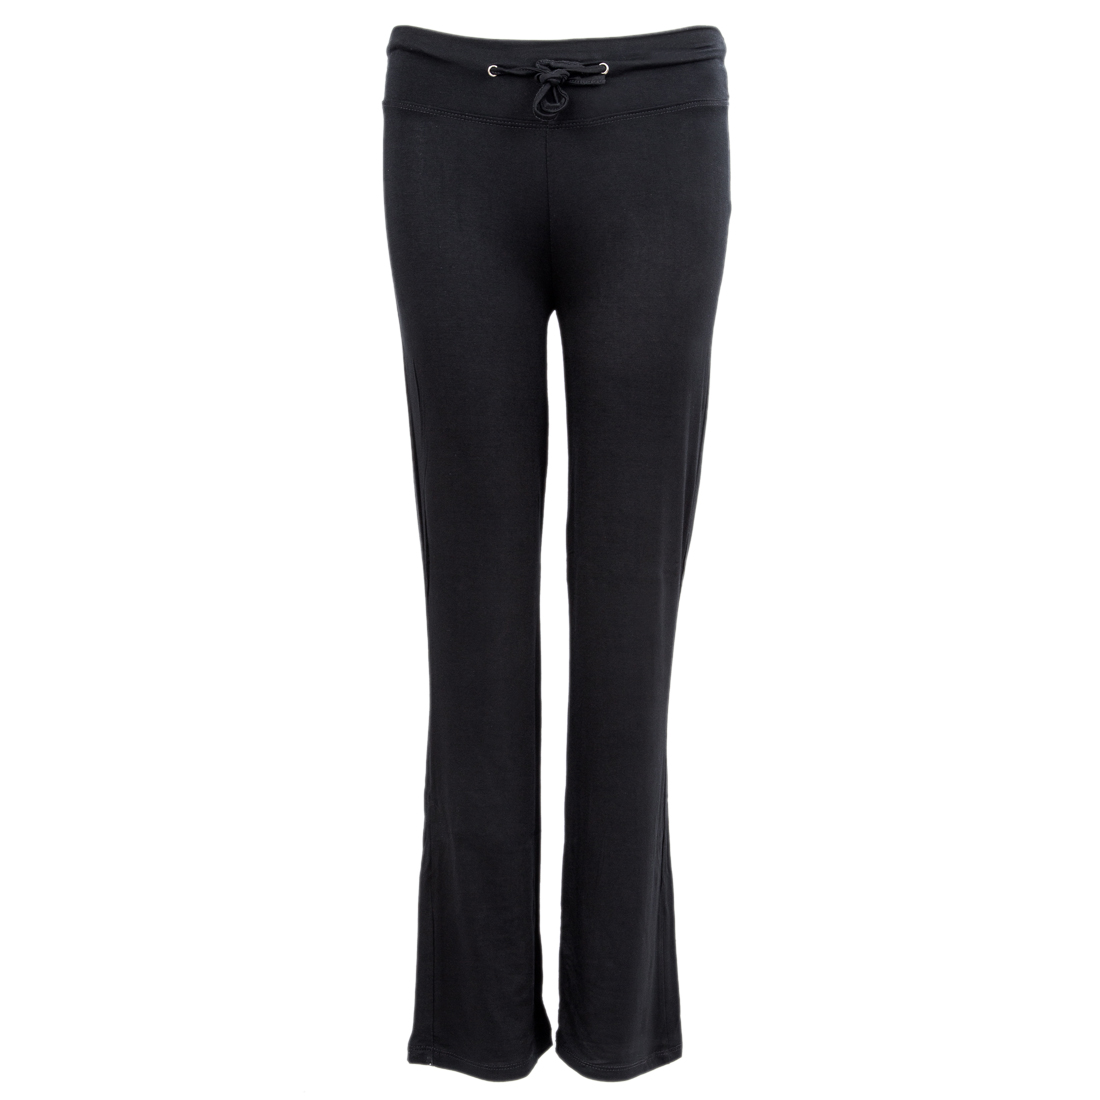 ①jho Modal Yoga Pants Trousers Fitness ᐂ Meditation